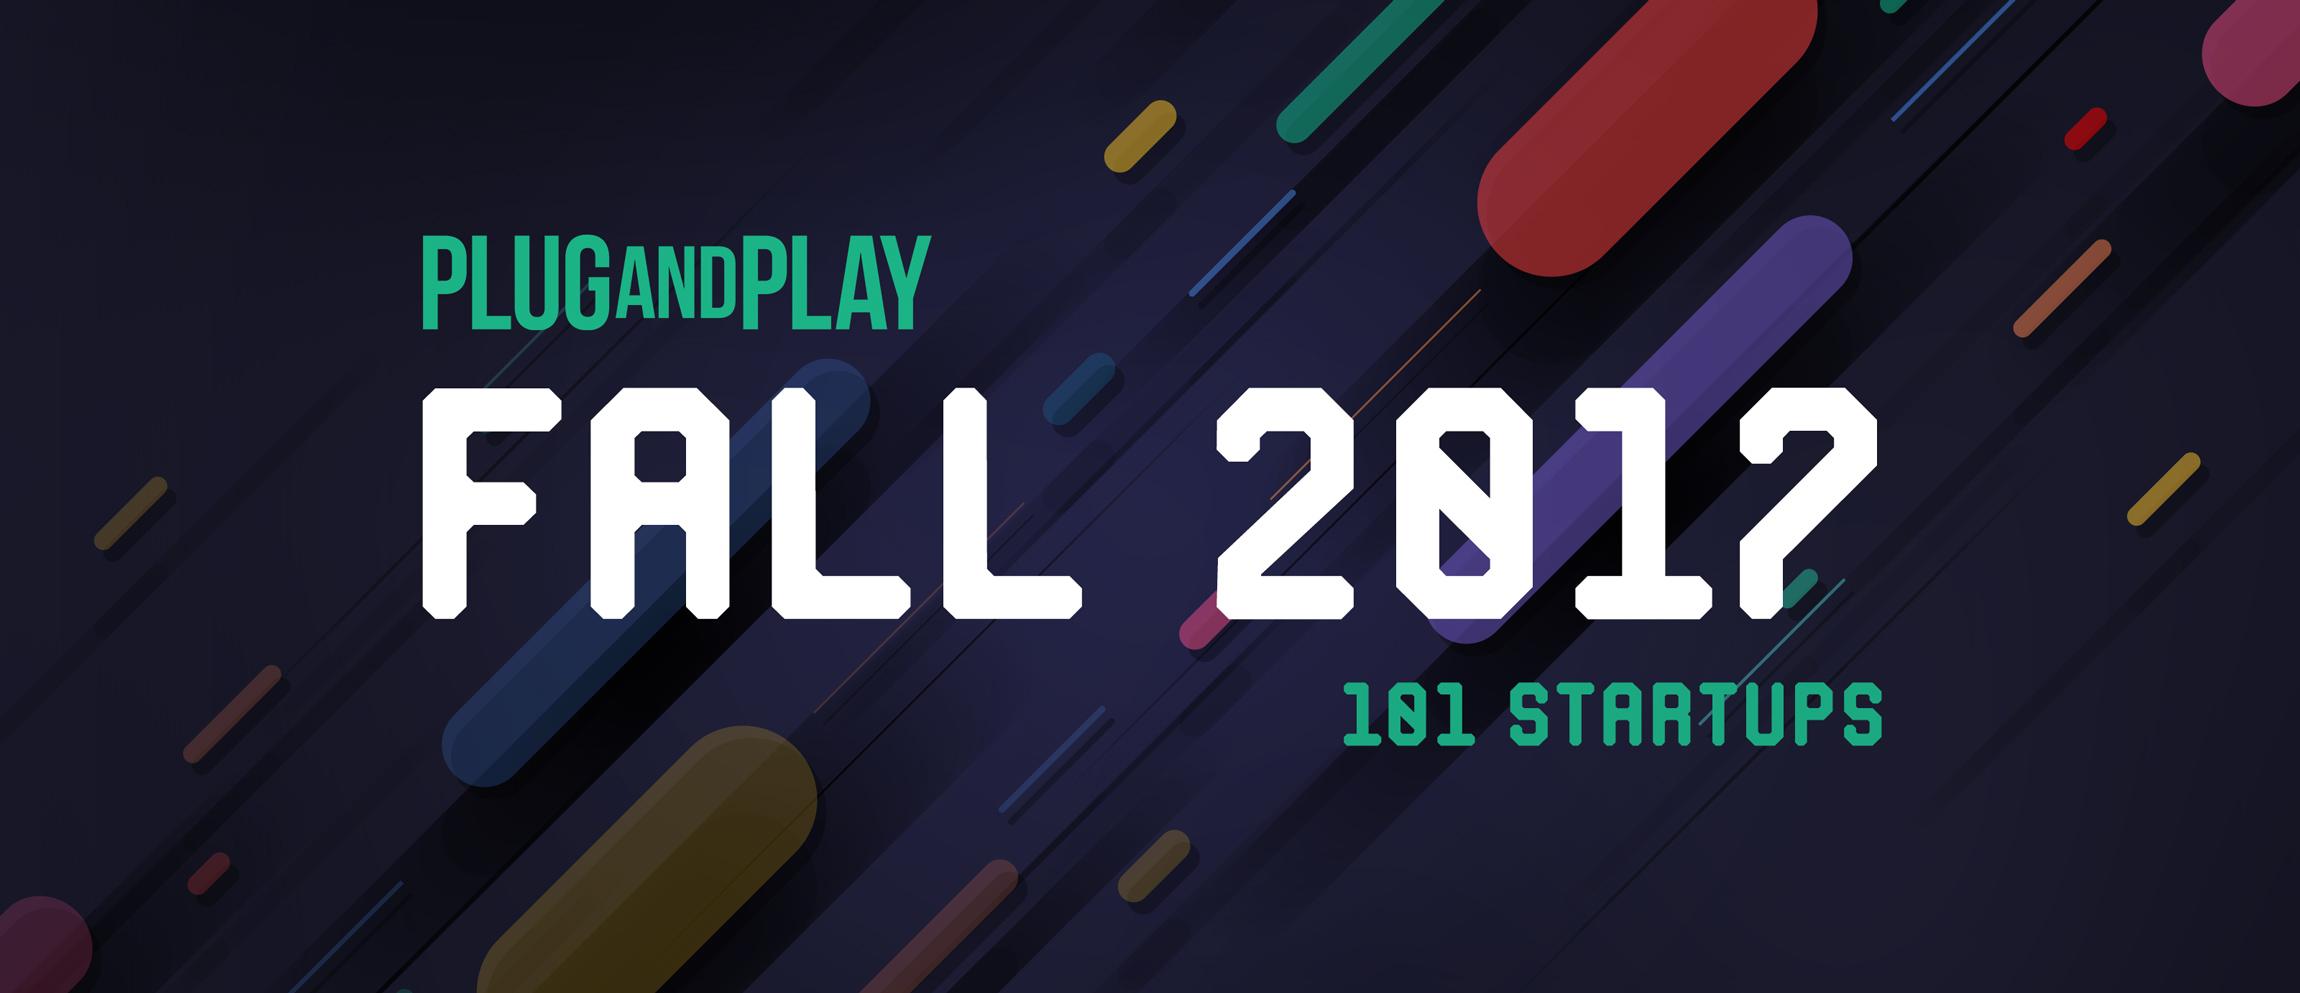 plug and play fintech 2017 startups